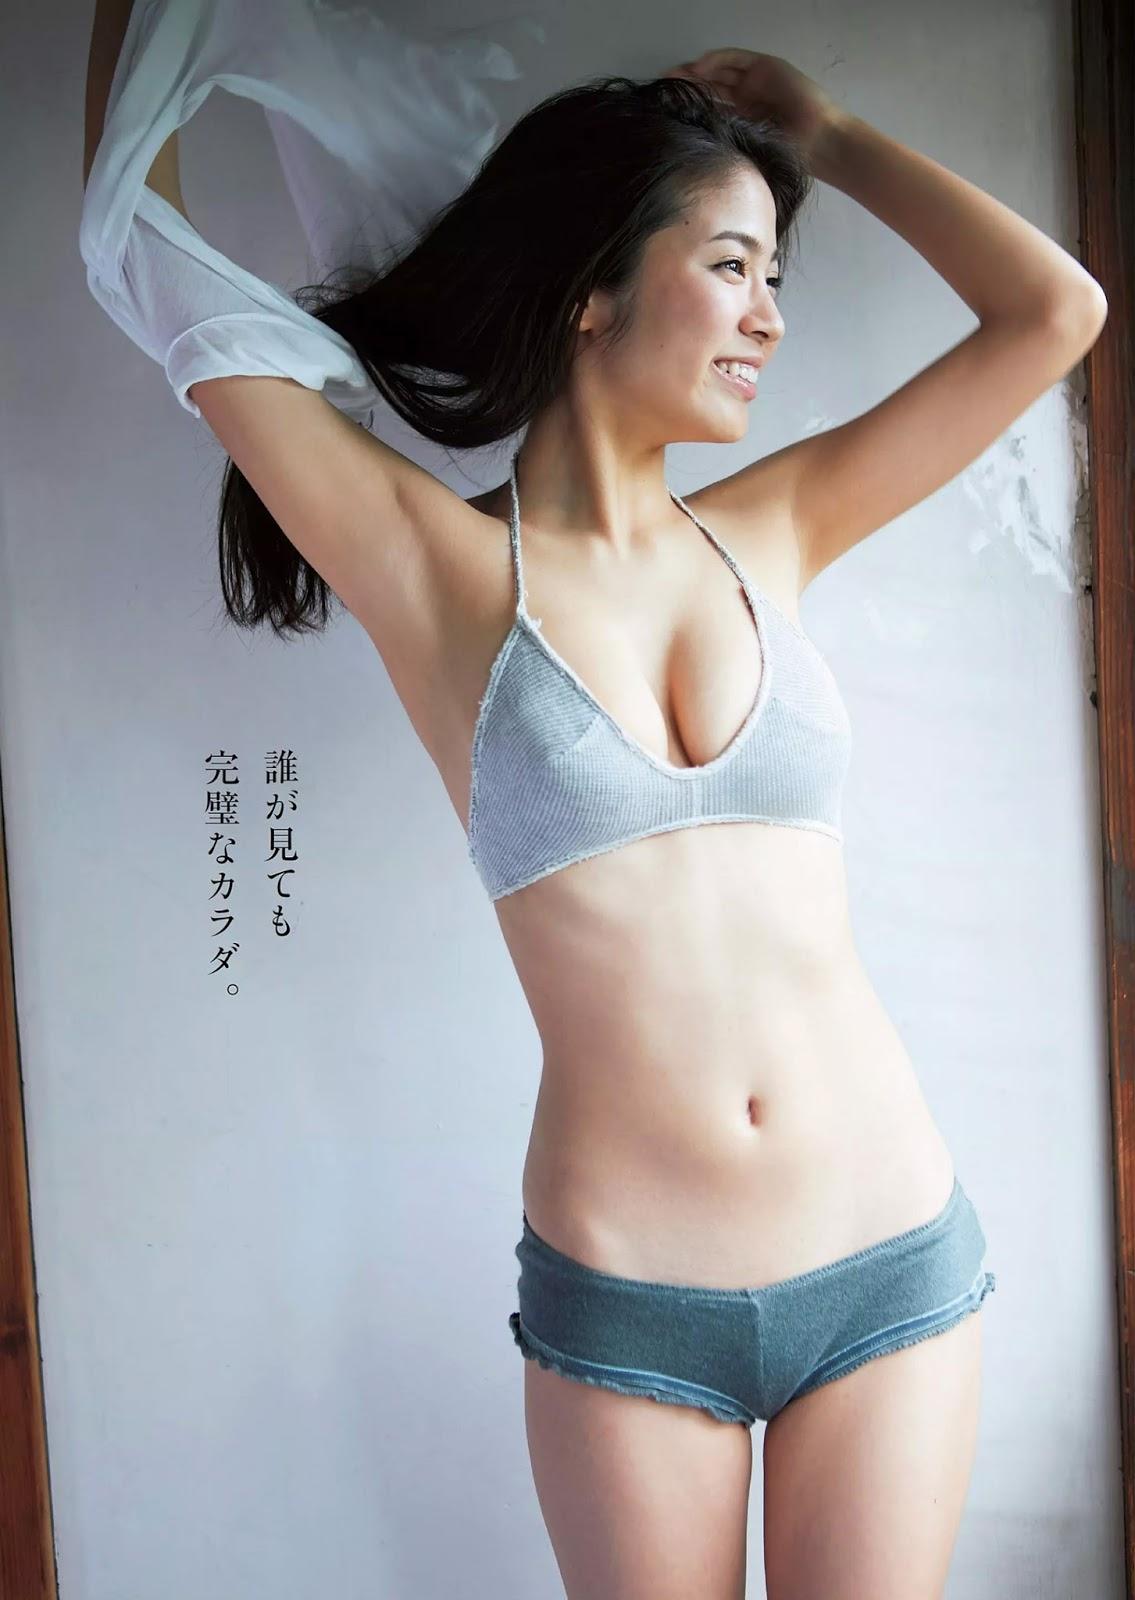 Runa Sawakita 澤北るな, Weekly Playboy 2017 No.48 (週刊プレイボーイ 2017年48号)